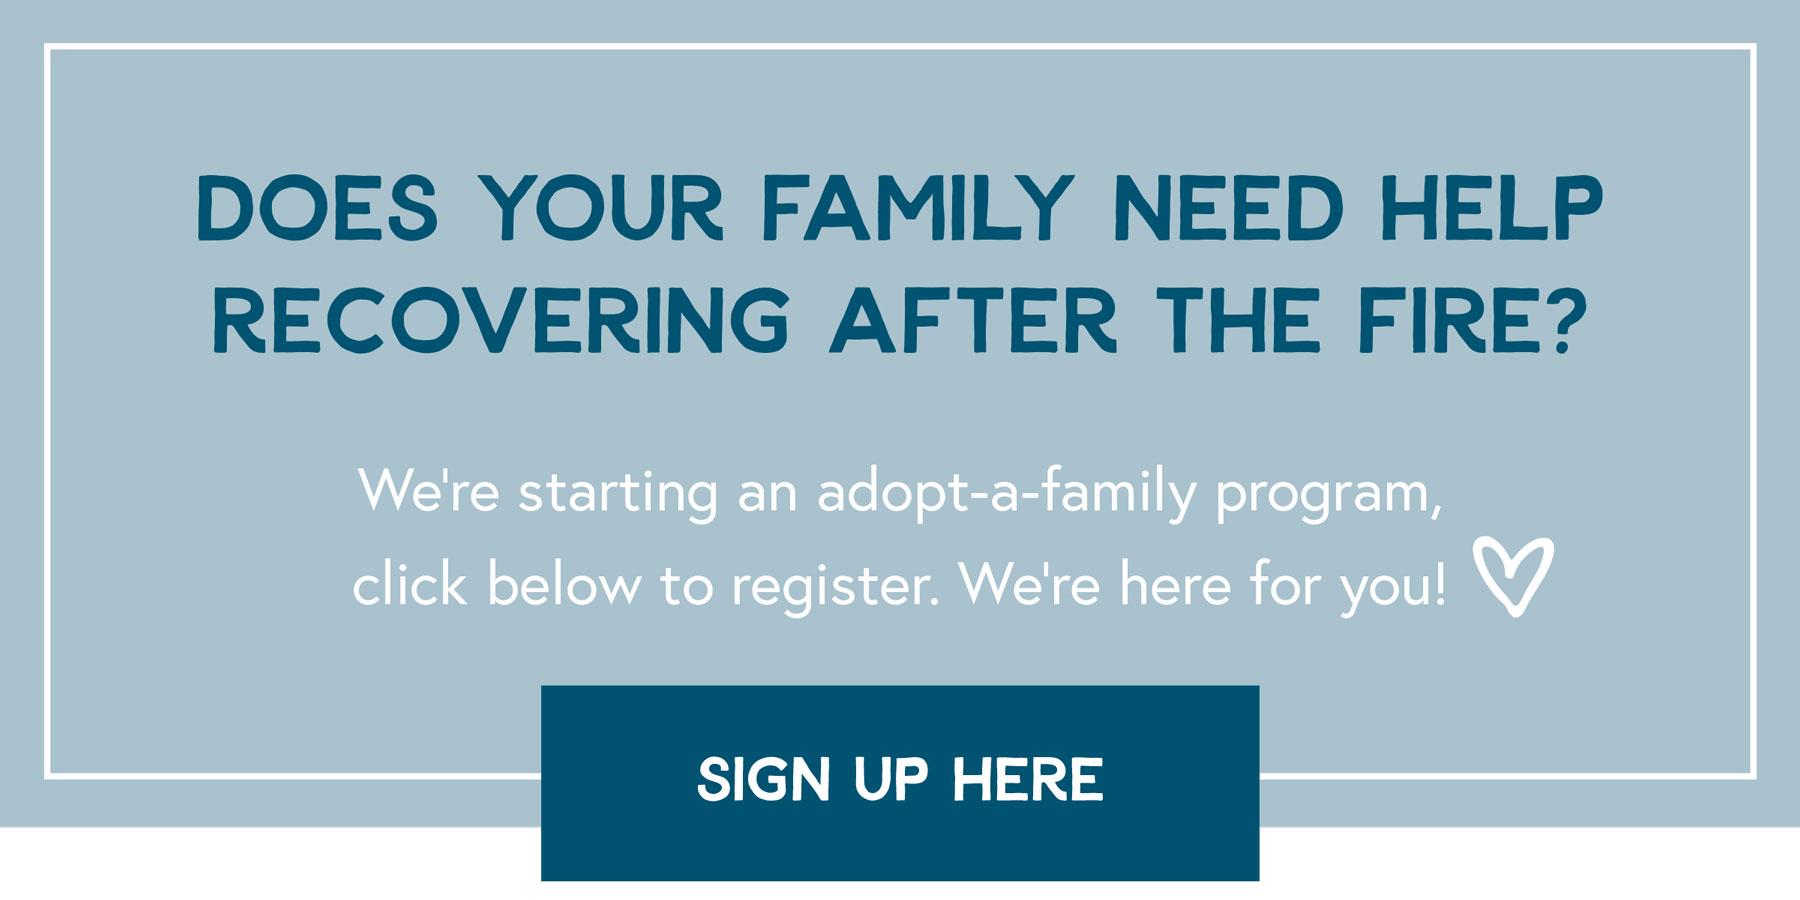 malibu-love-adopt-a-family.jpg